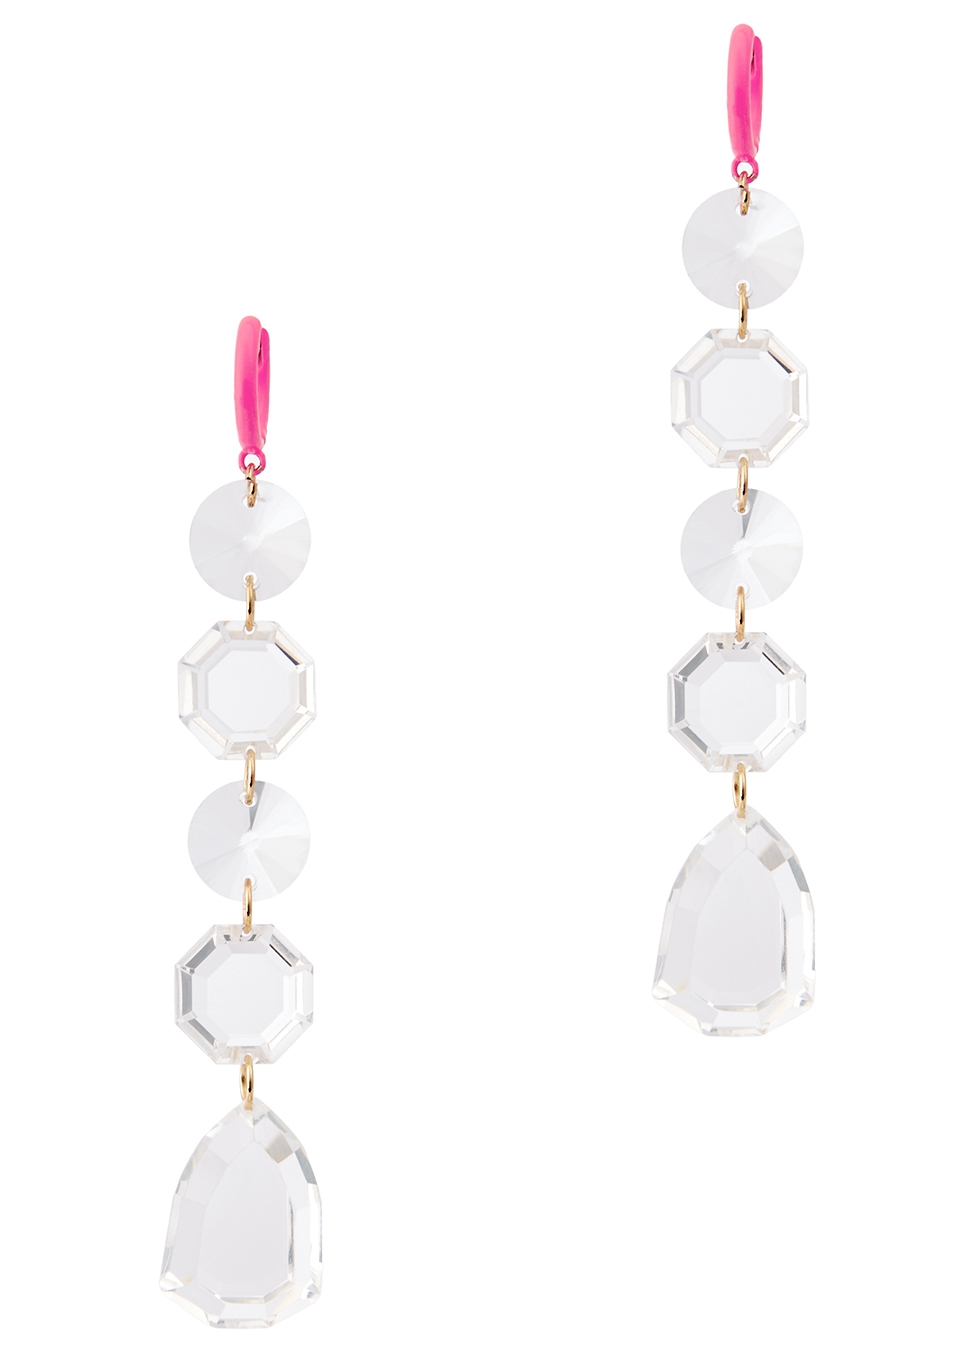 Sofianne acrylic crystal drop earrings - Baublebar